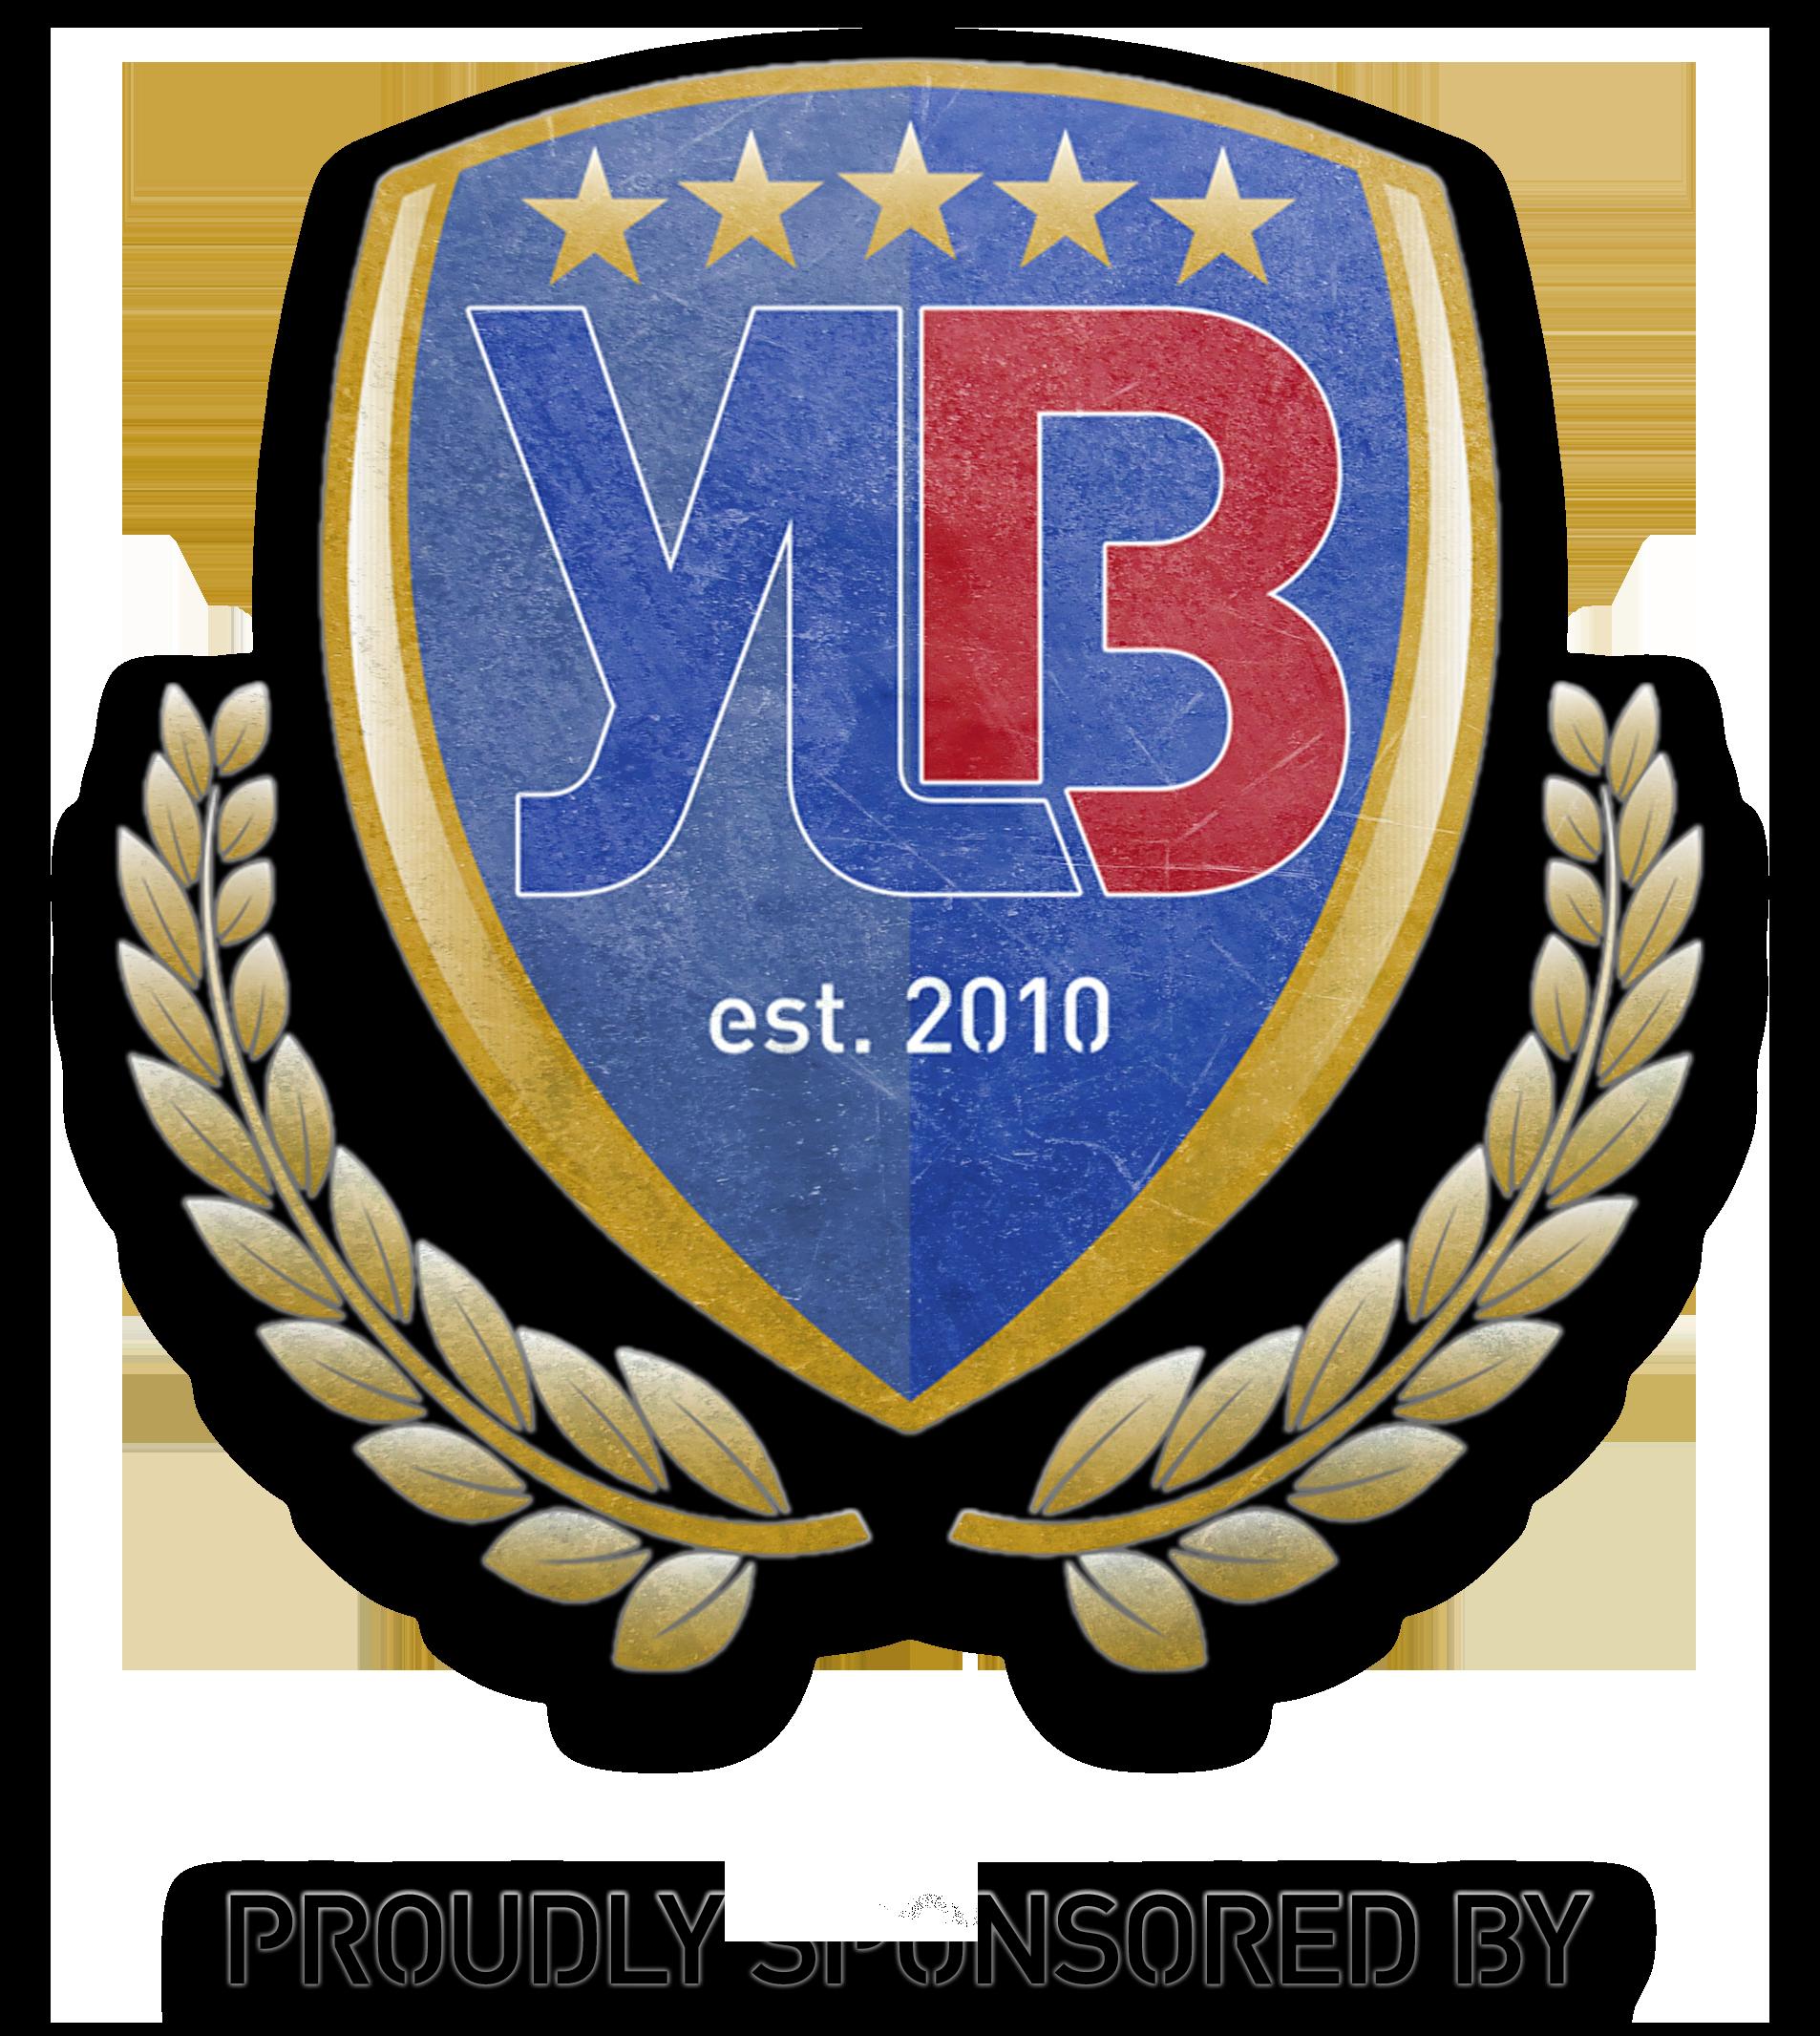 YLB-sponsor-Logo.png